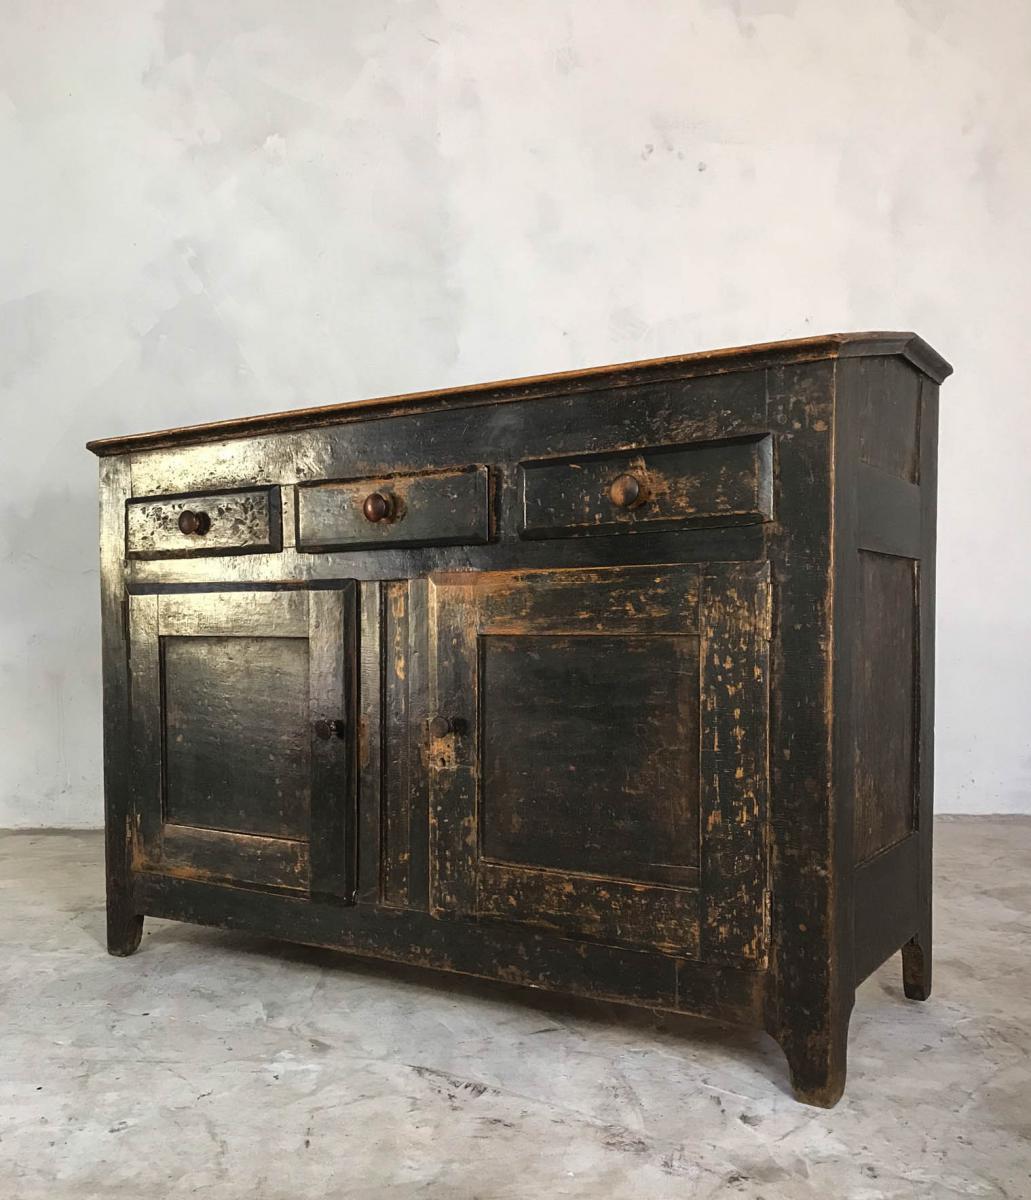 19th Century English Oak Cupboard Sideboard Waiter Station Original Black Paint